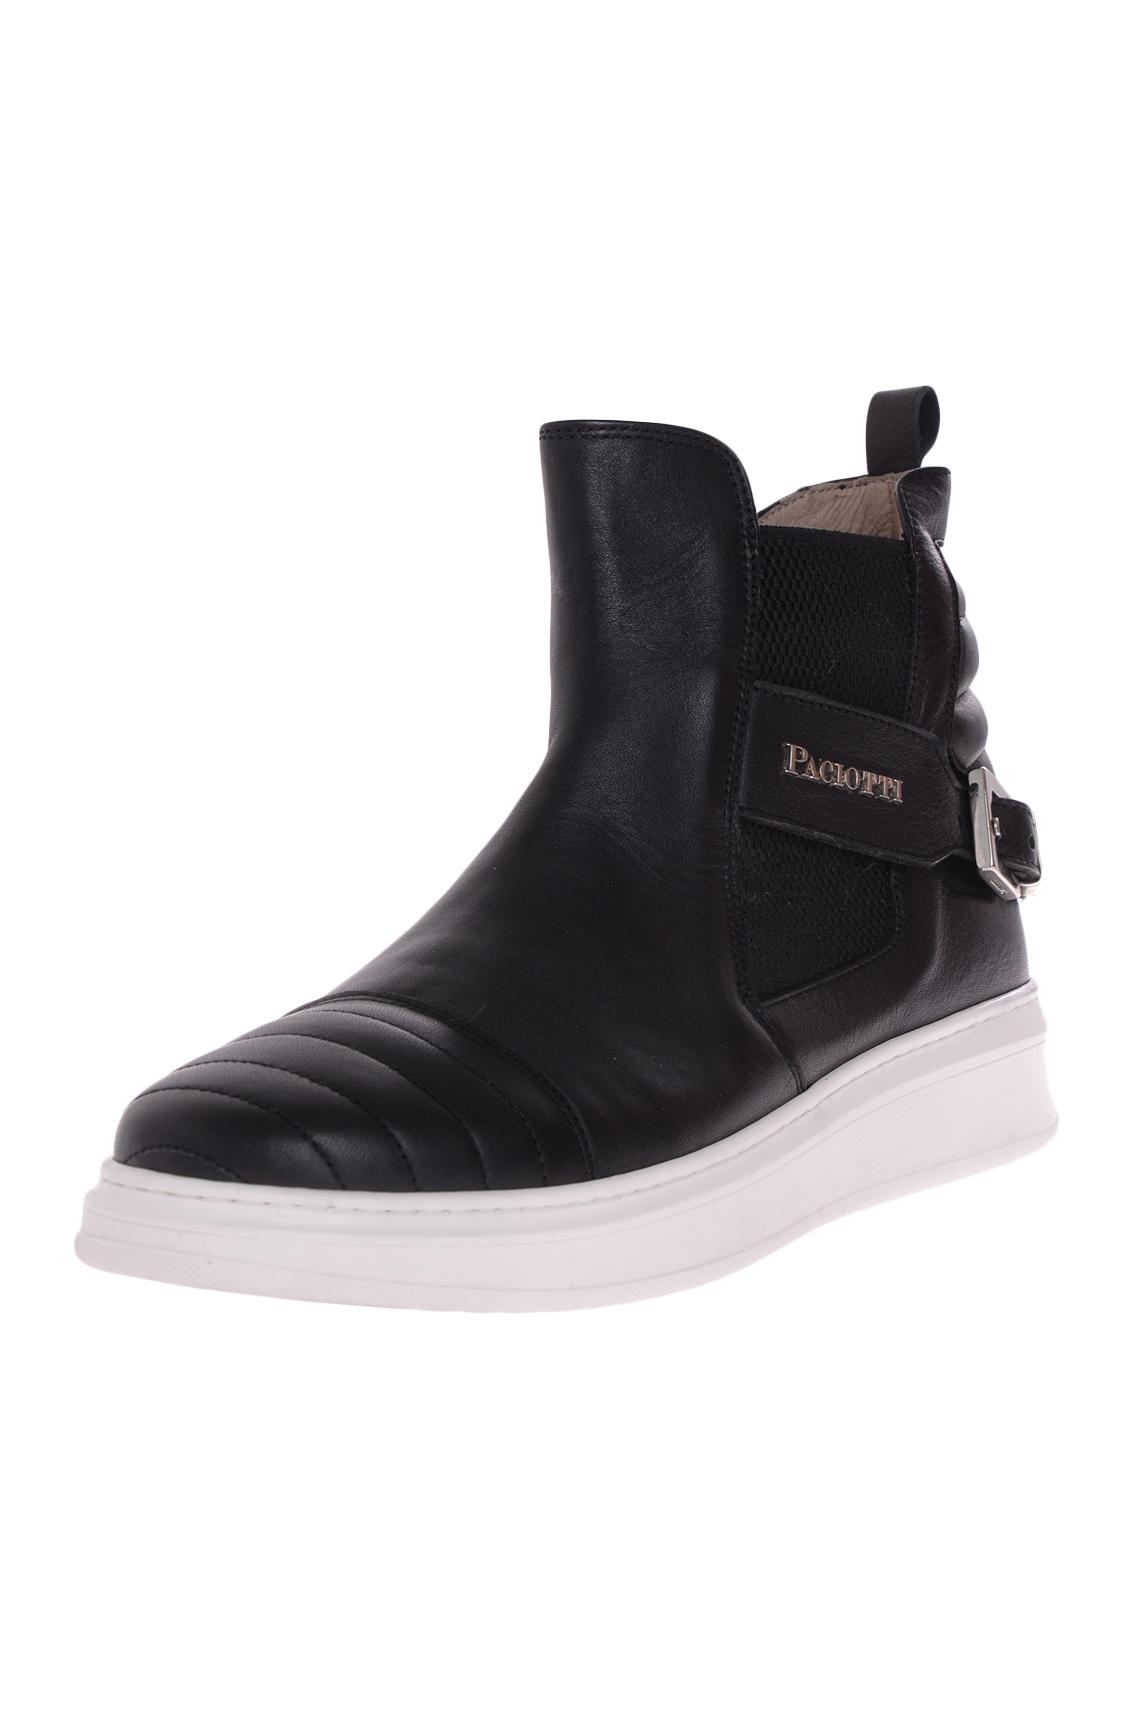 Ботинки Cesare Paciotti 4US